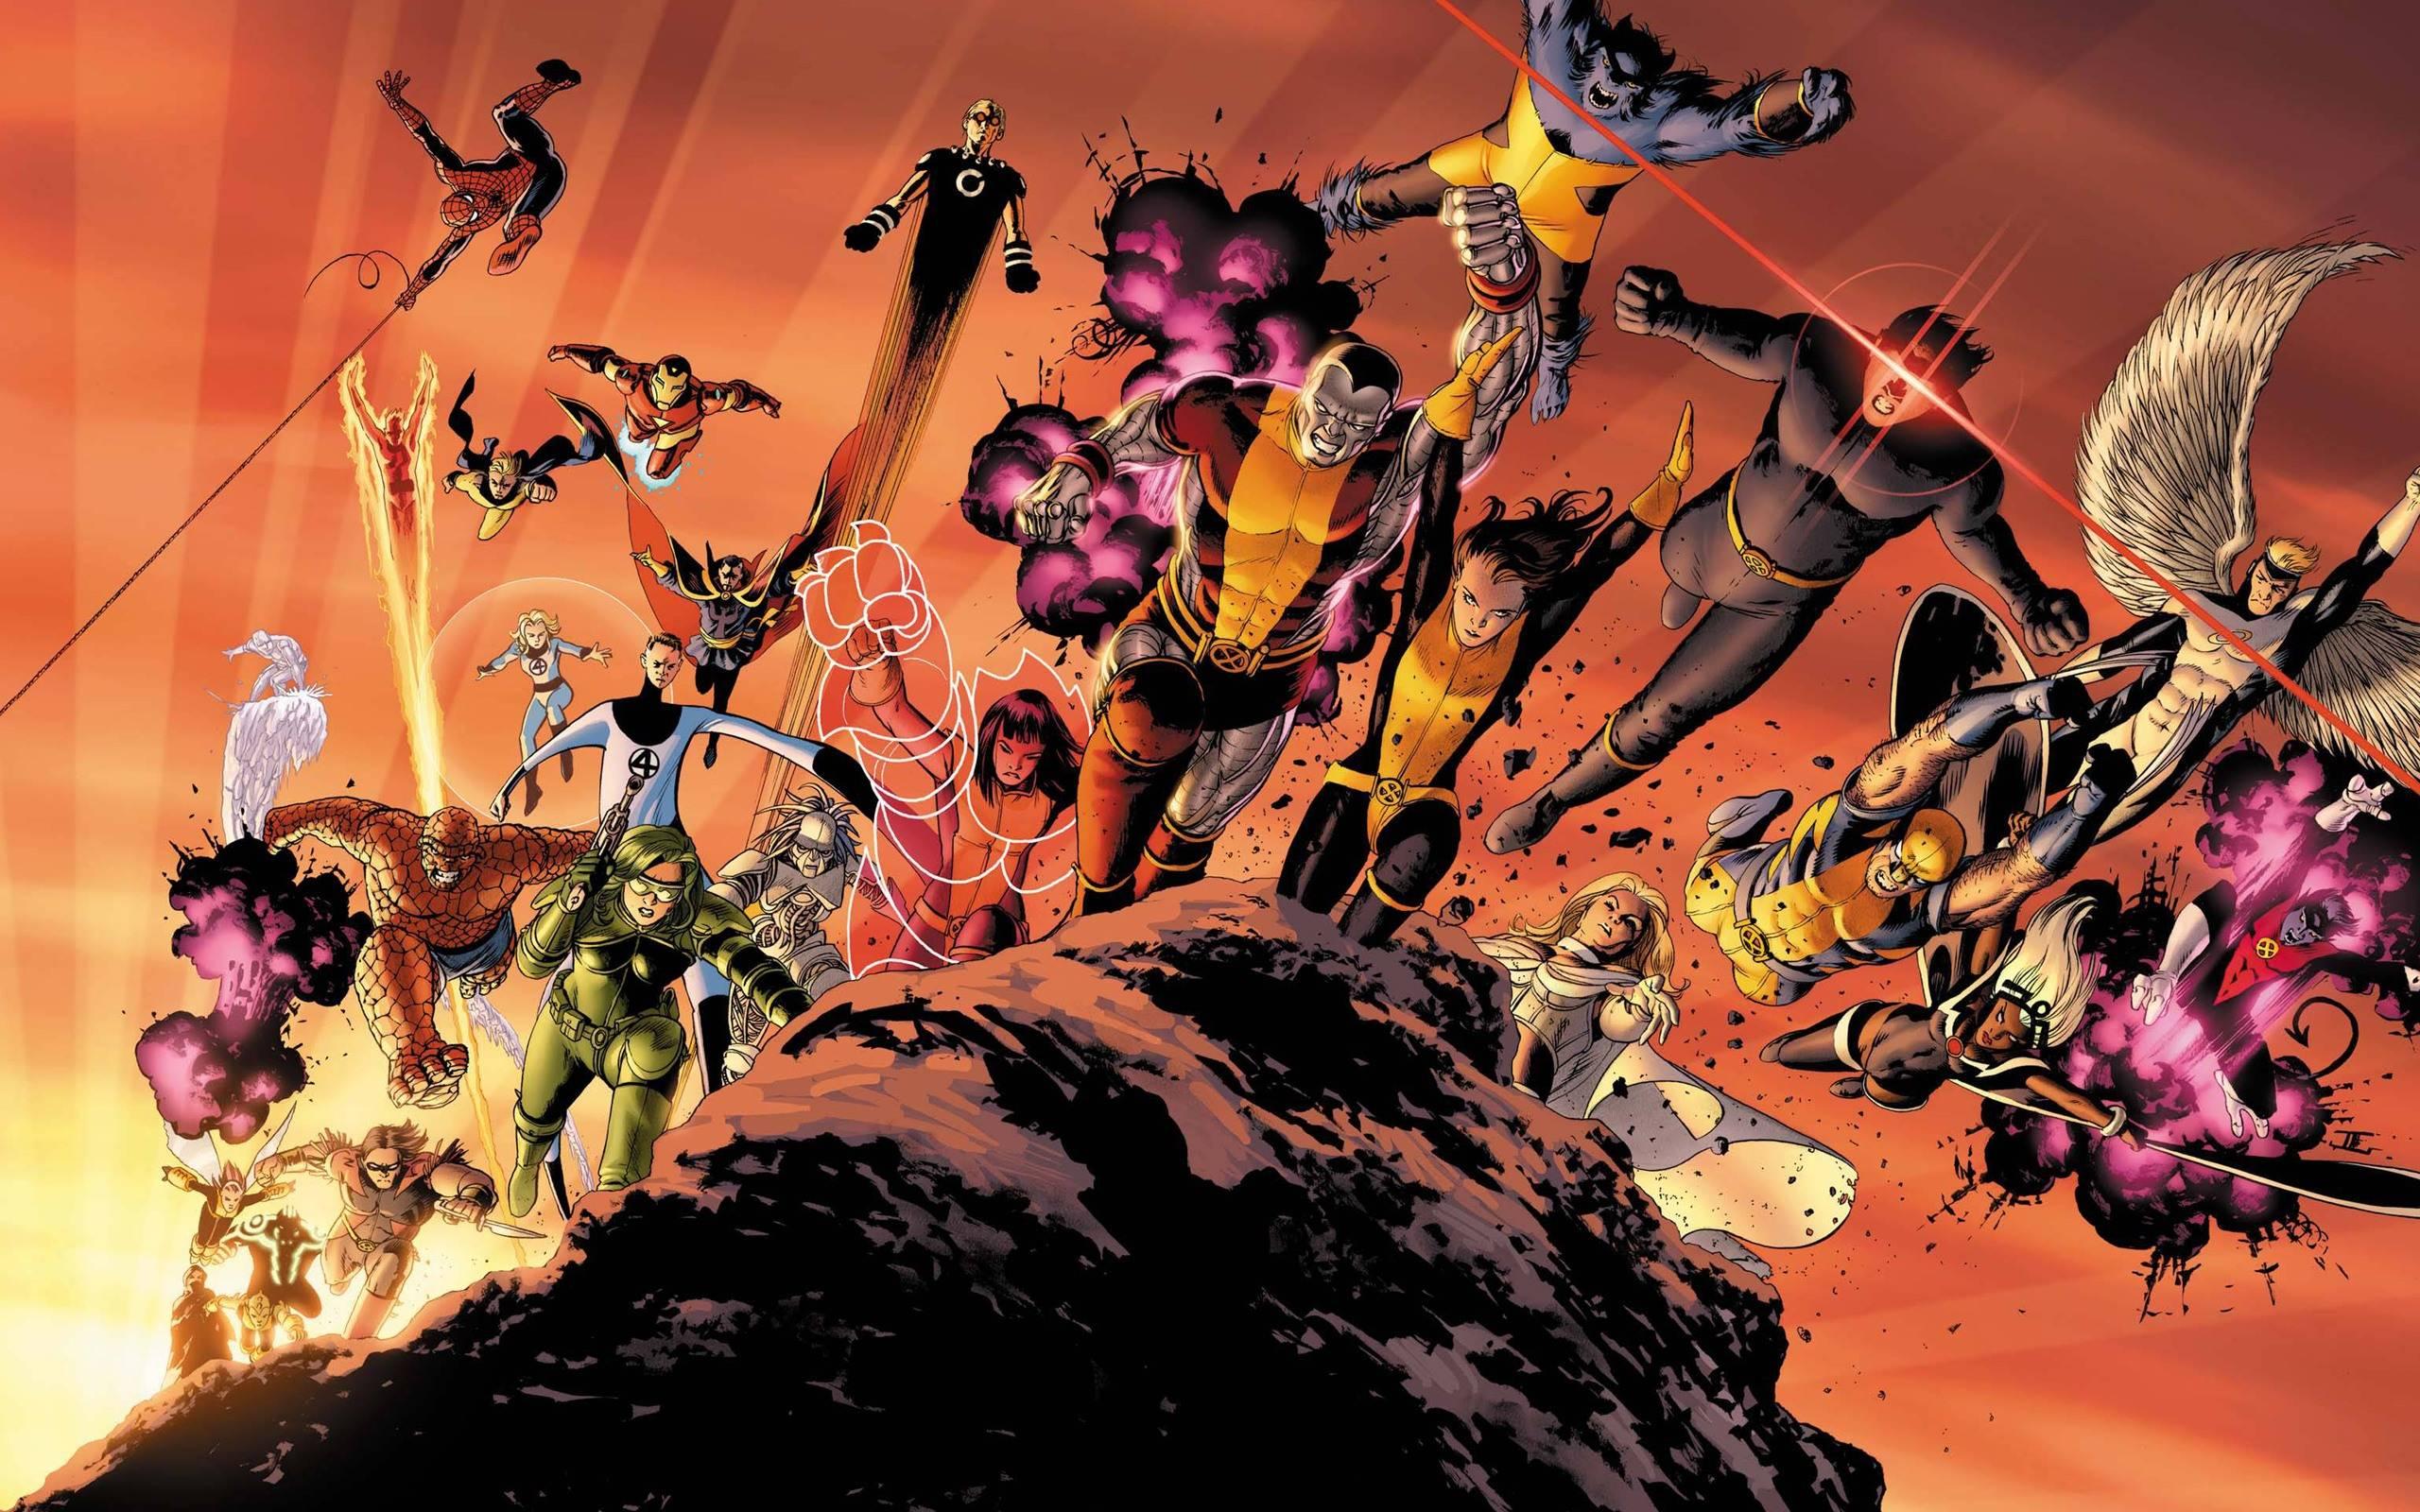 X Men Anime 4k Wallpapers Top Free X Men Anime 4k Backgrounds